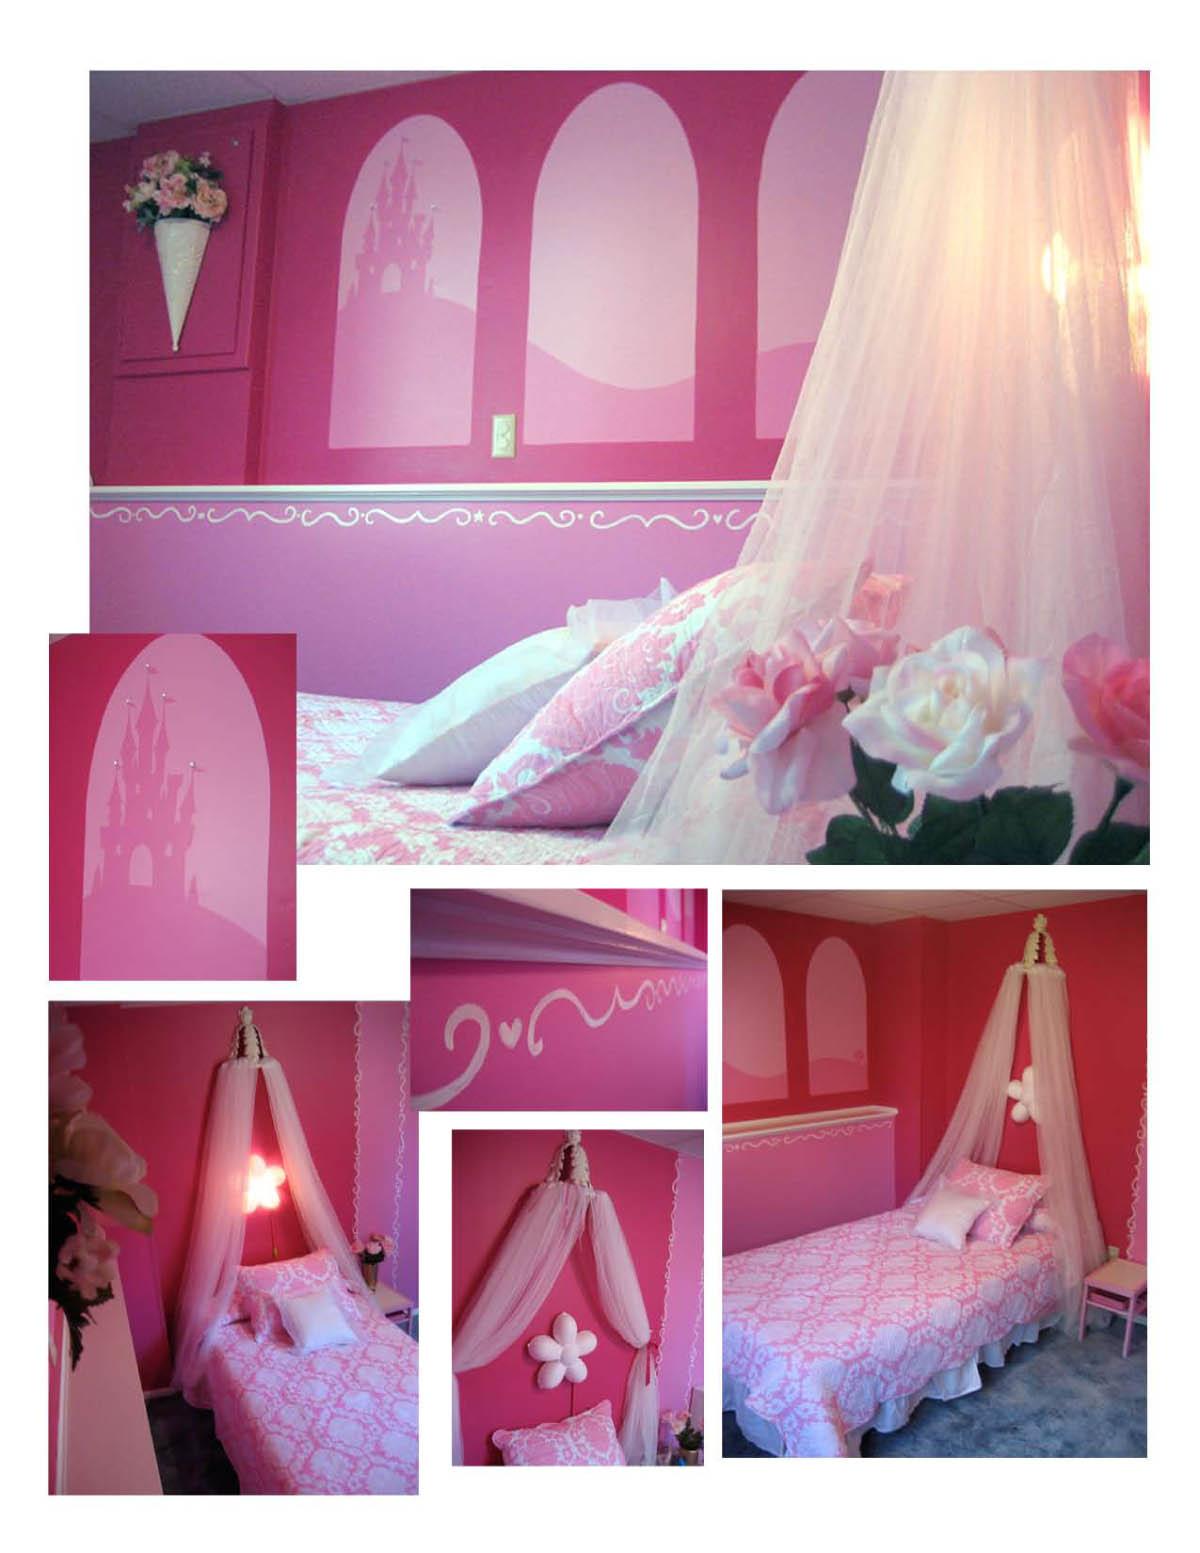 Disney Princess Bedroom Decor Photograph | ID Mommy: DIY Pri